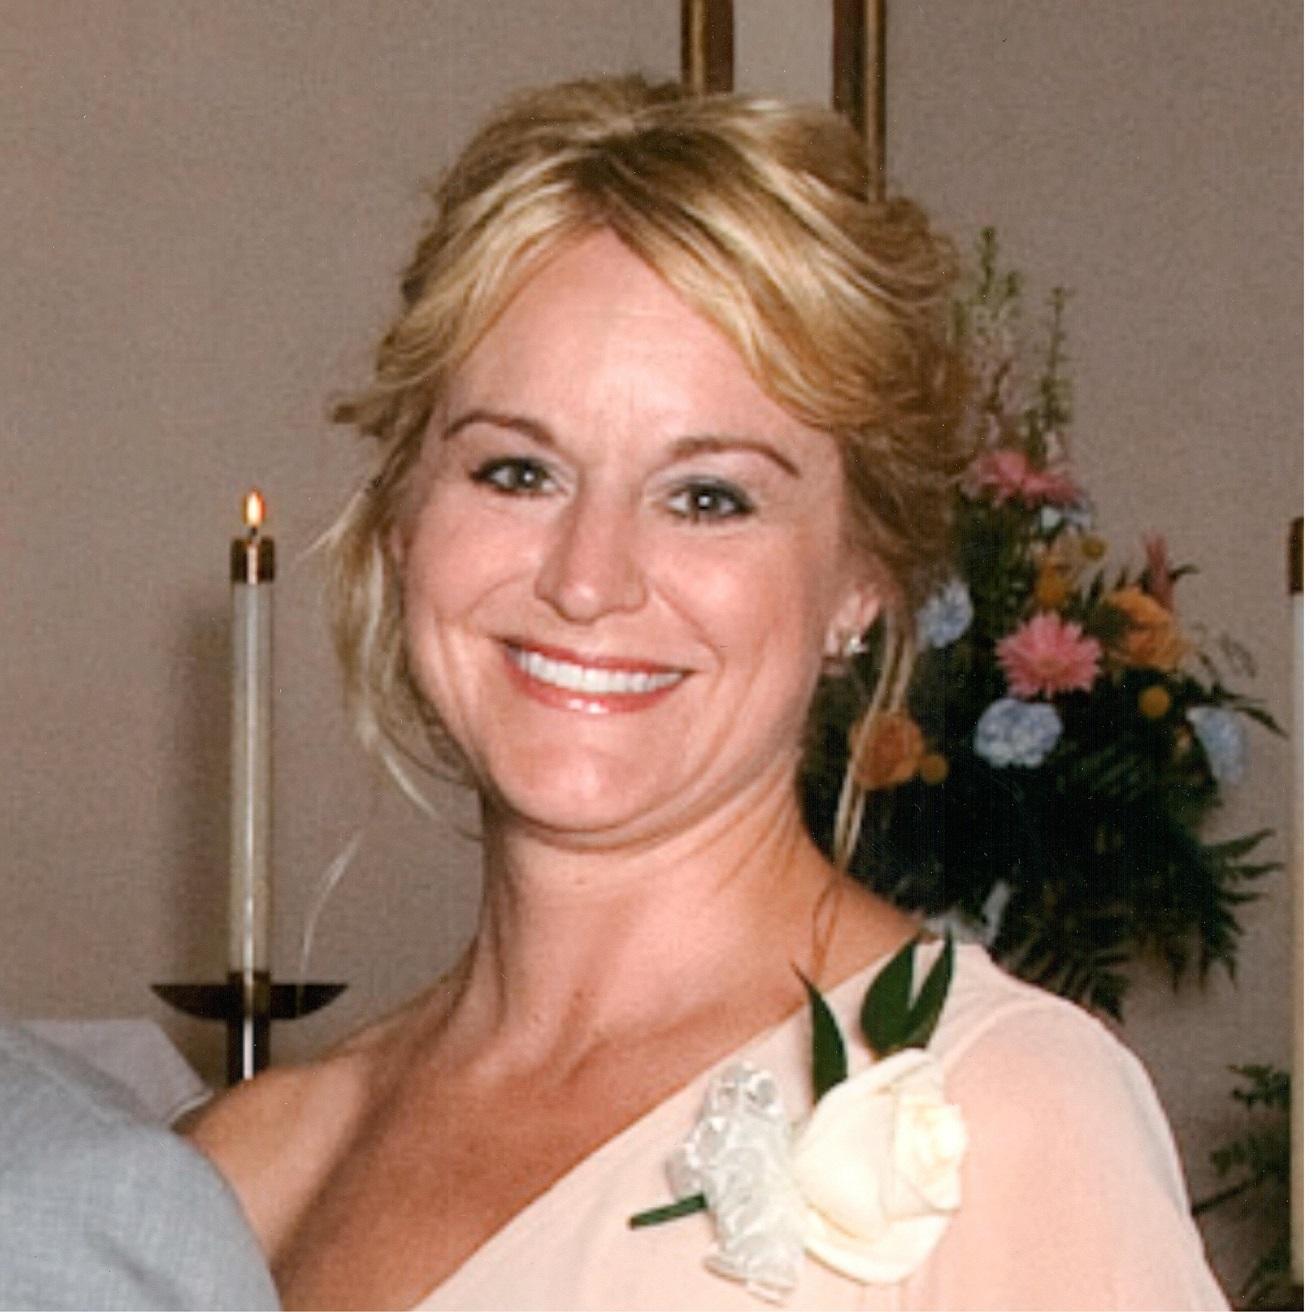 Jan Marie Blackgrave, age 45 of Celestine